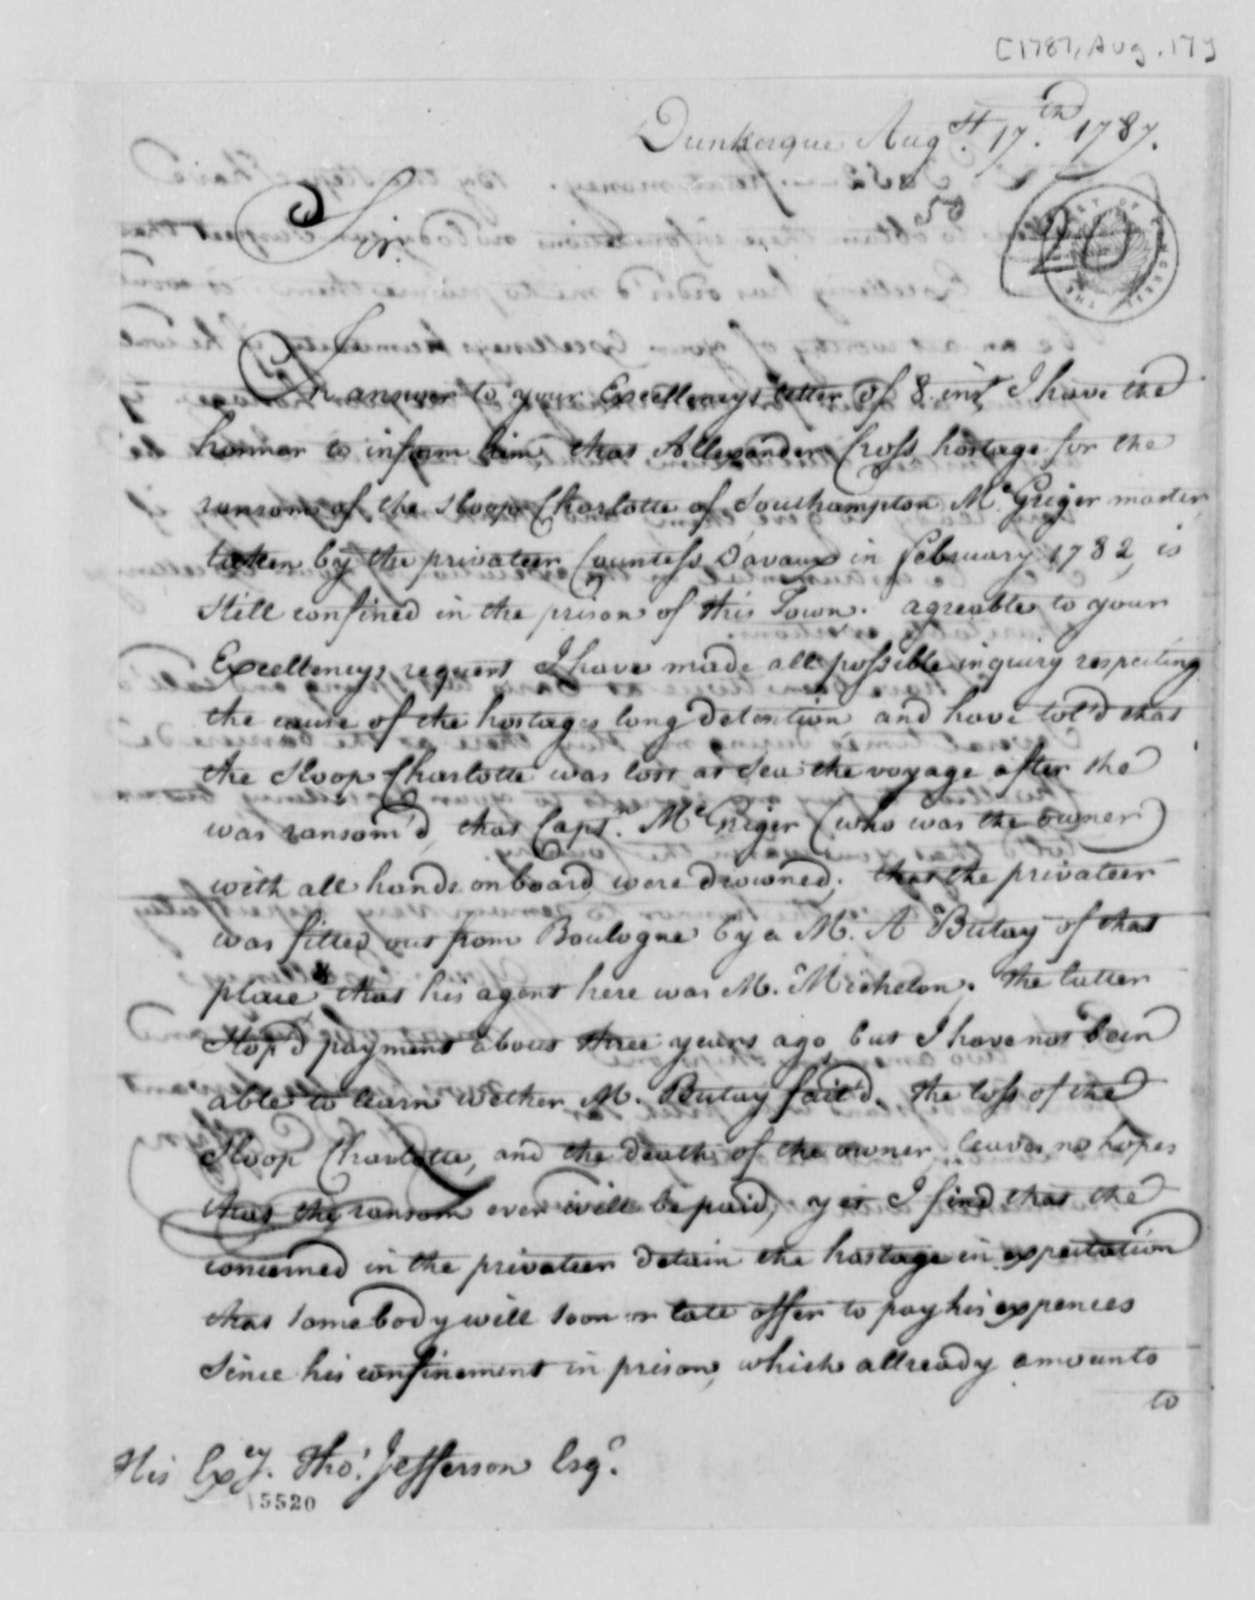 Francis Coffyn to Thomas Jefferson, August 17, 1787